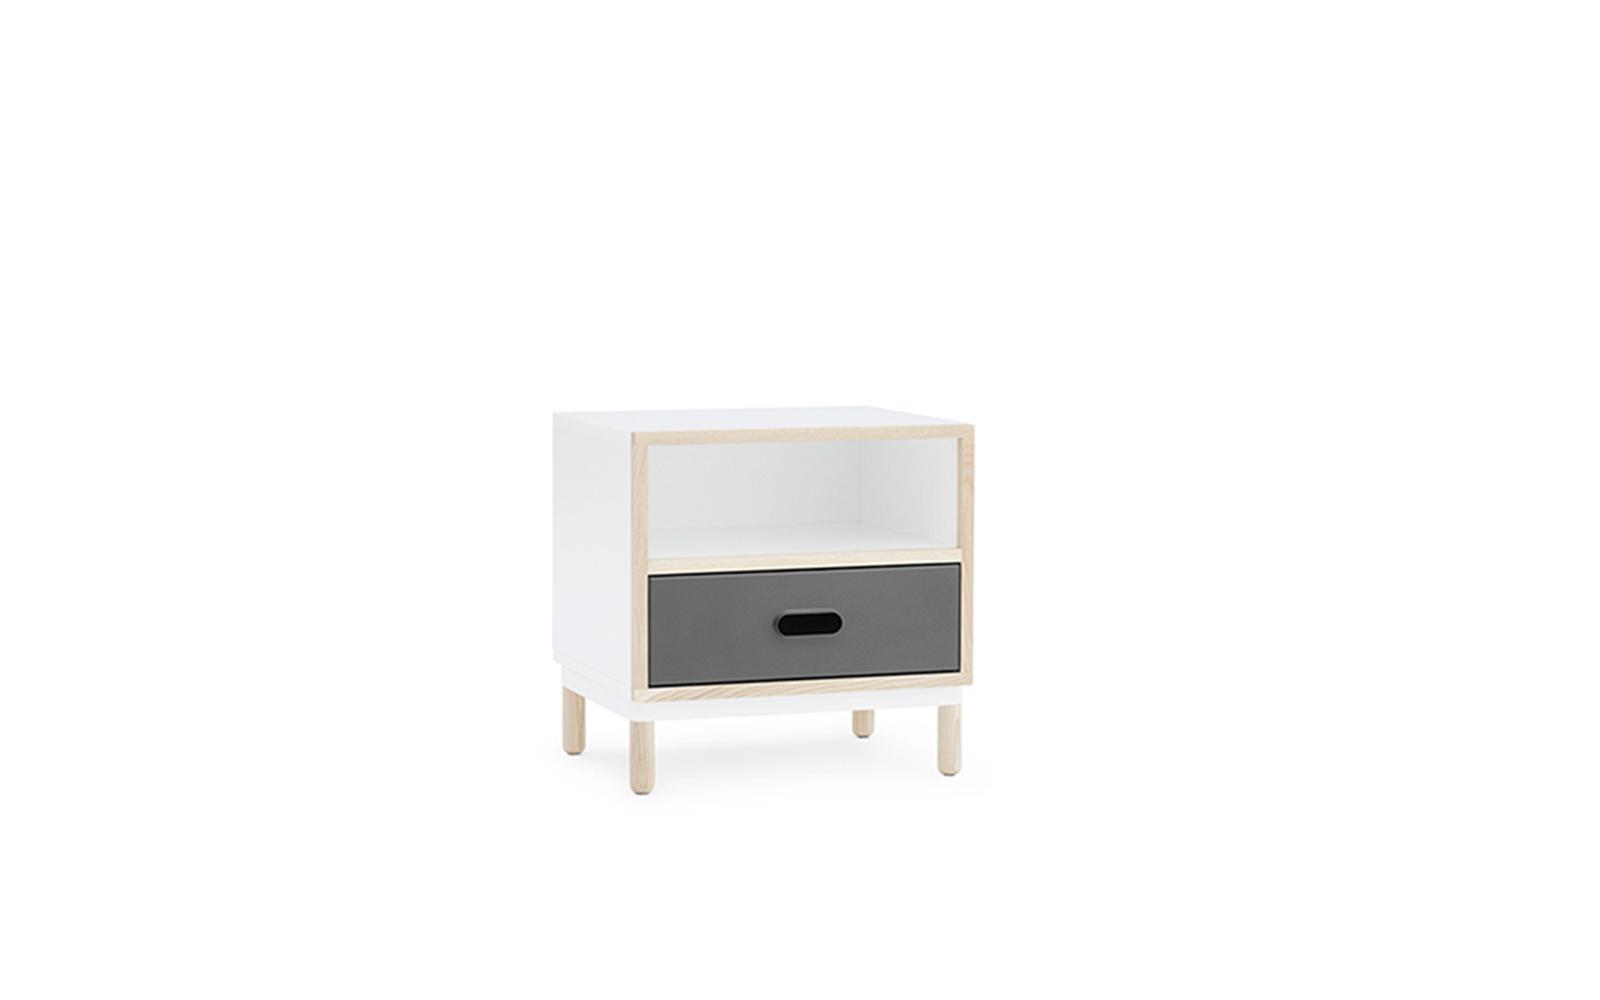 Kabino bedside table – a versatile urban storage piece